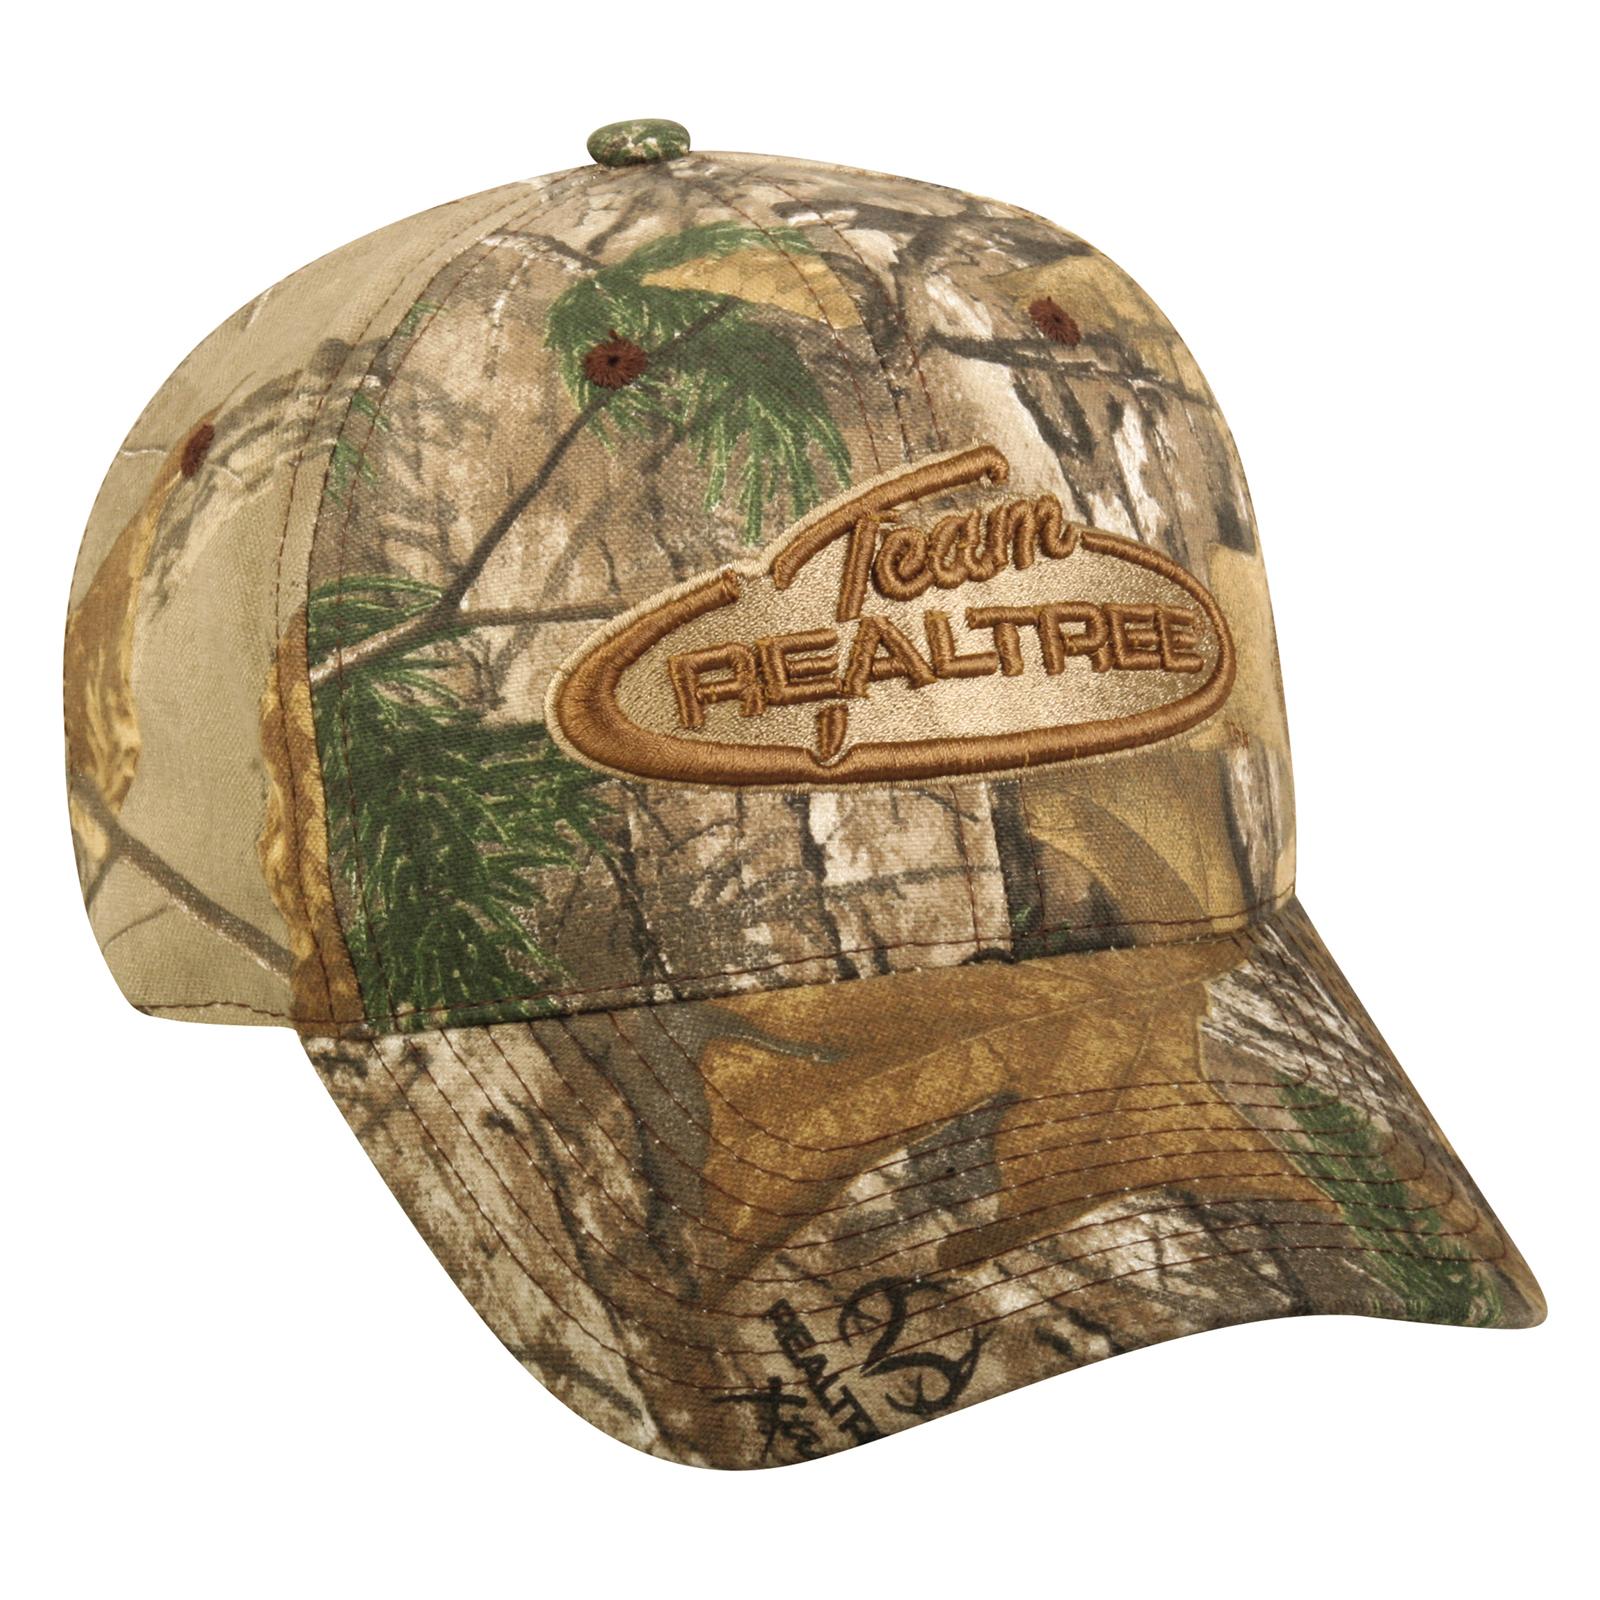 Team Realtree Signature Camo Hat